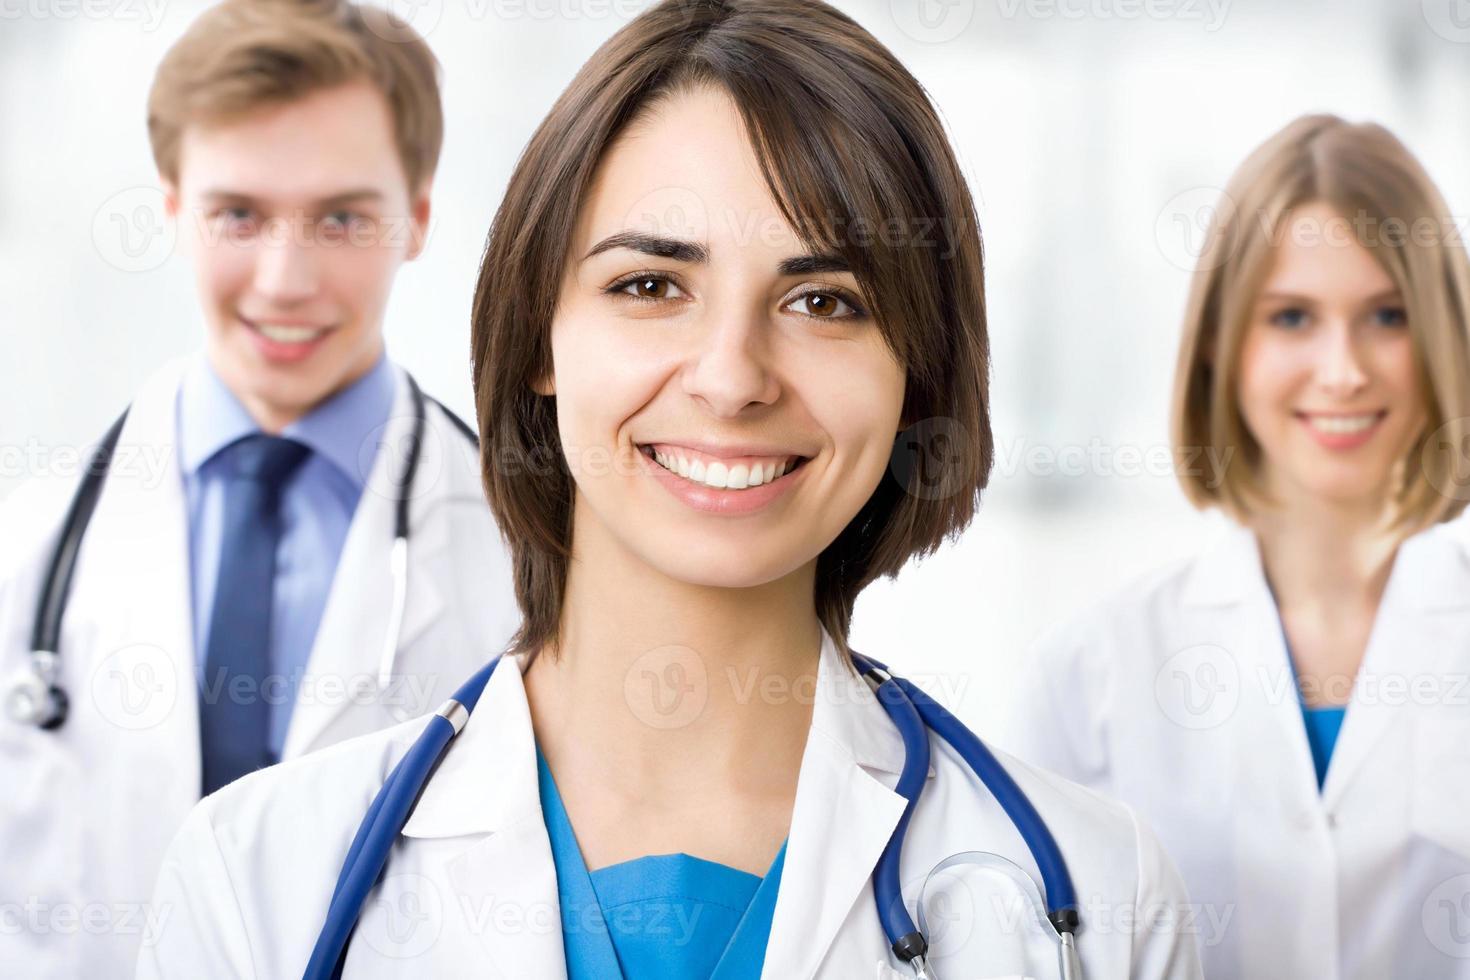 Female doctor photo